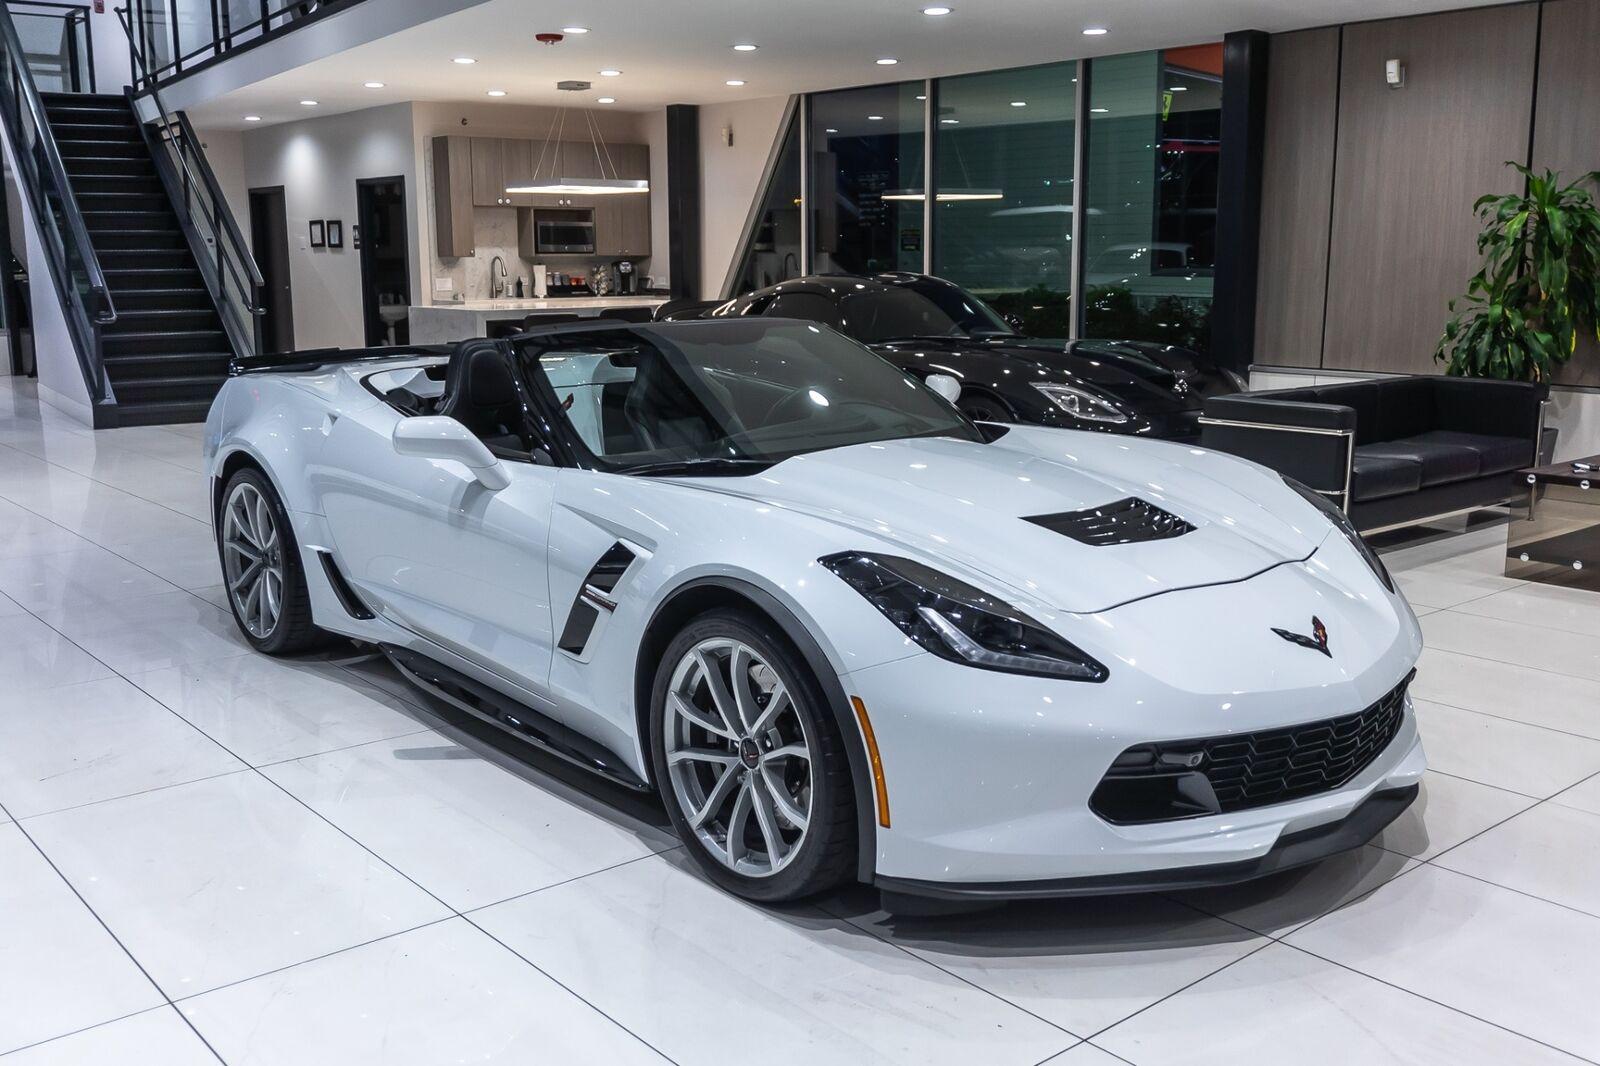 2019 White Chevrolet Corvette Convertible 2LT | C7 Corvette Photo 7